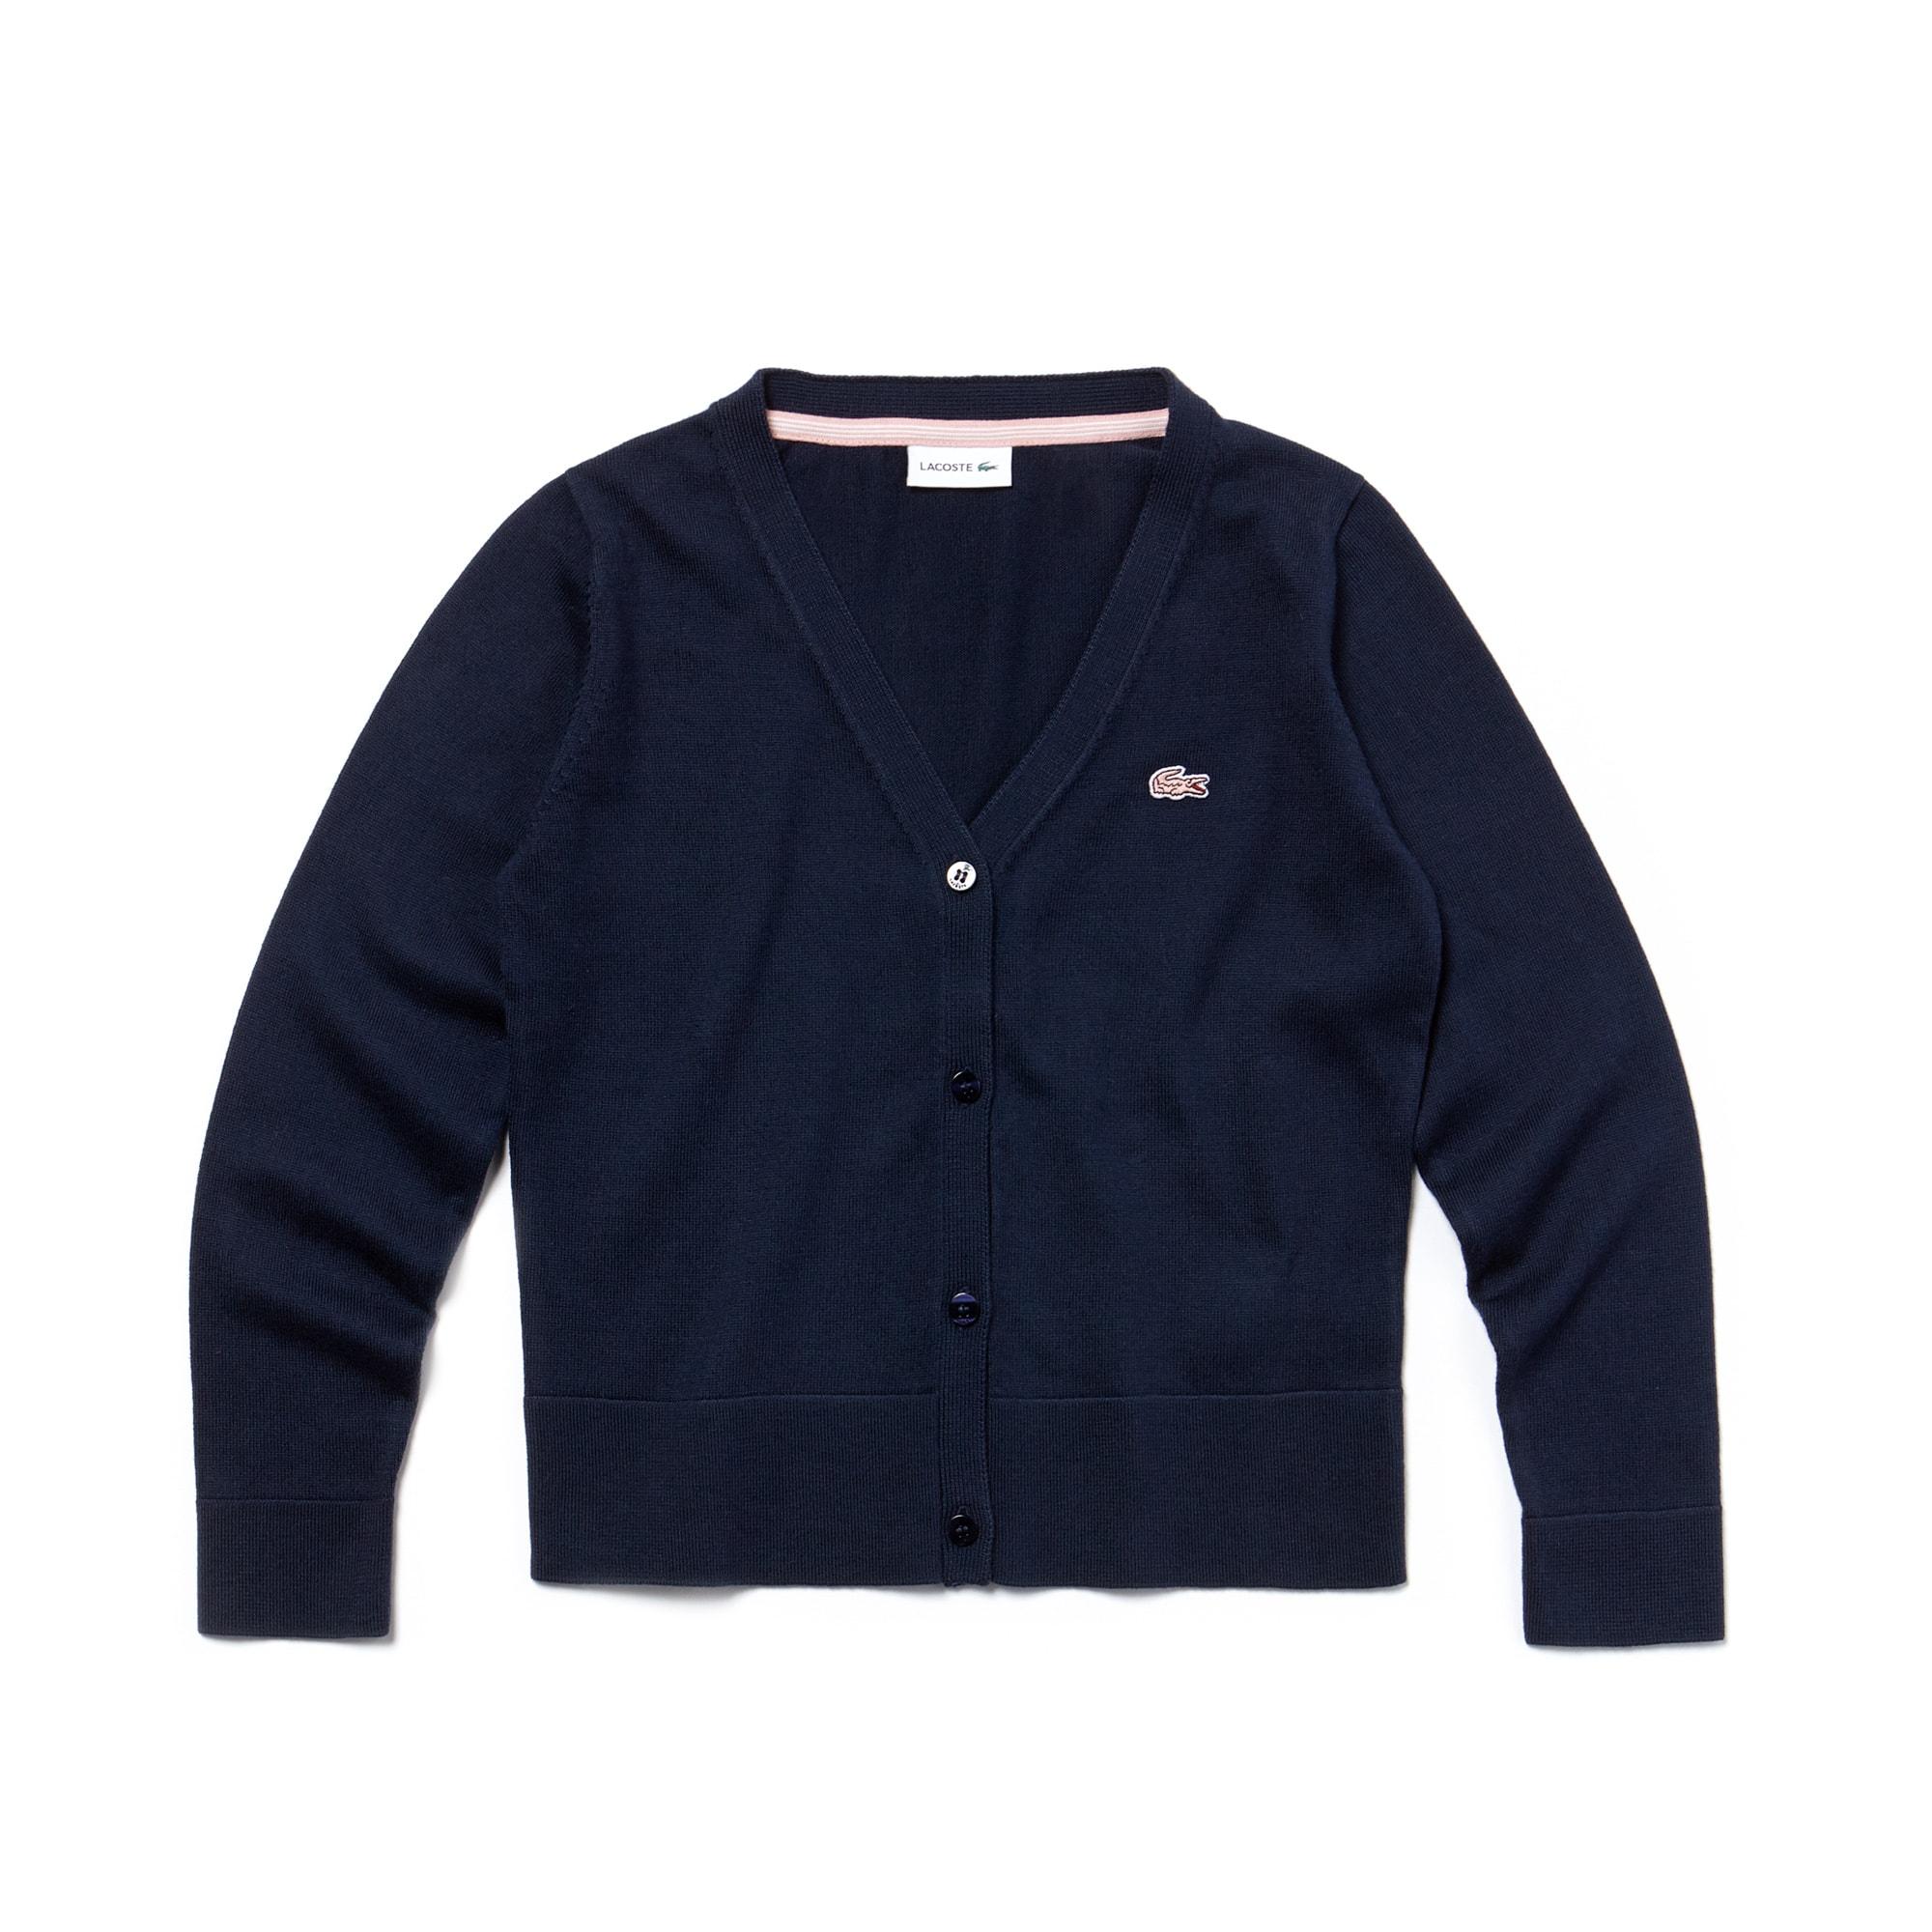 Girls' Cotton Jersey Cardigan